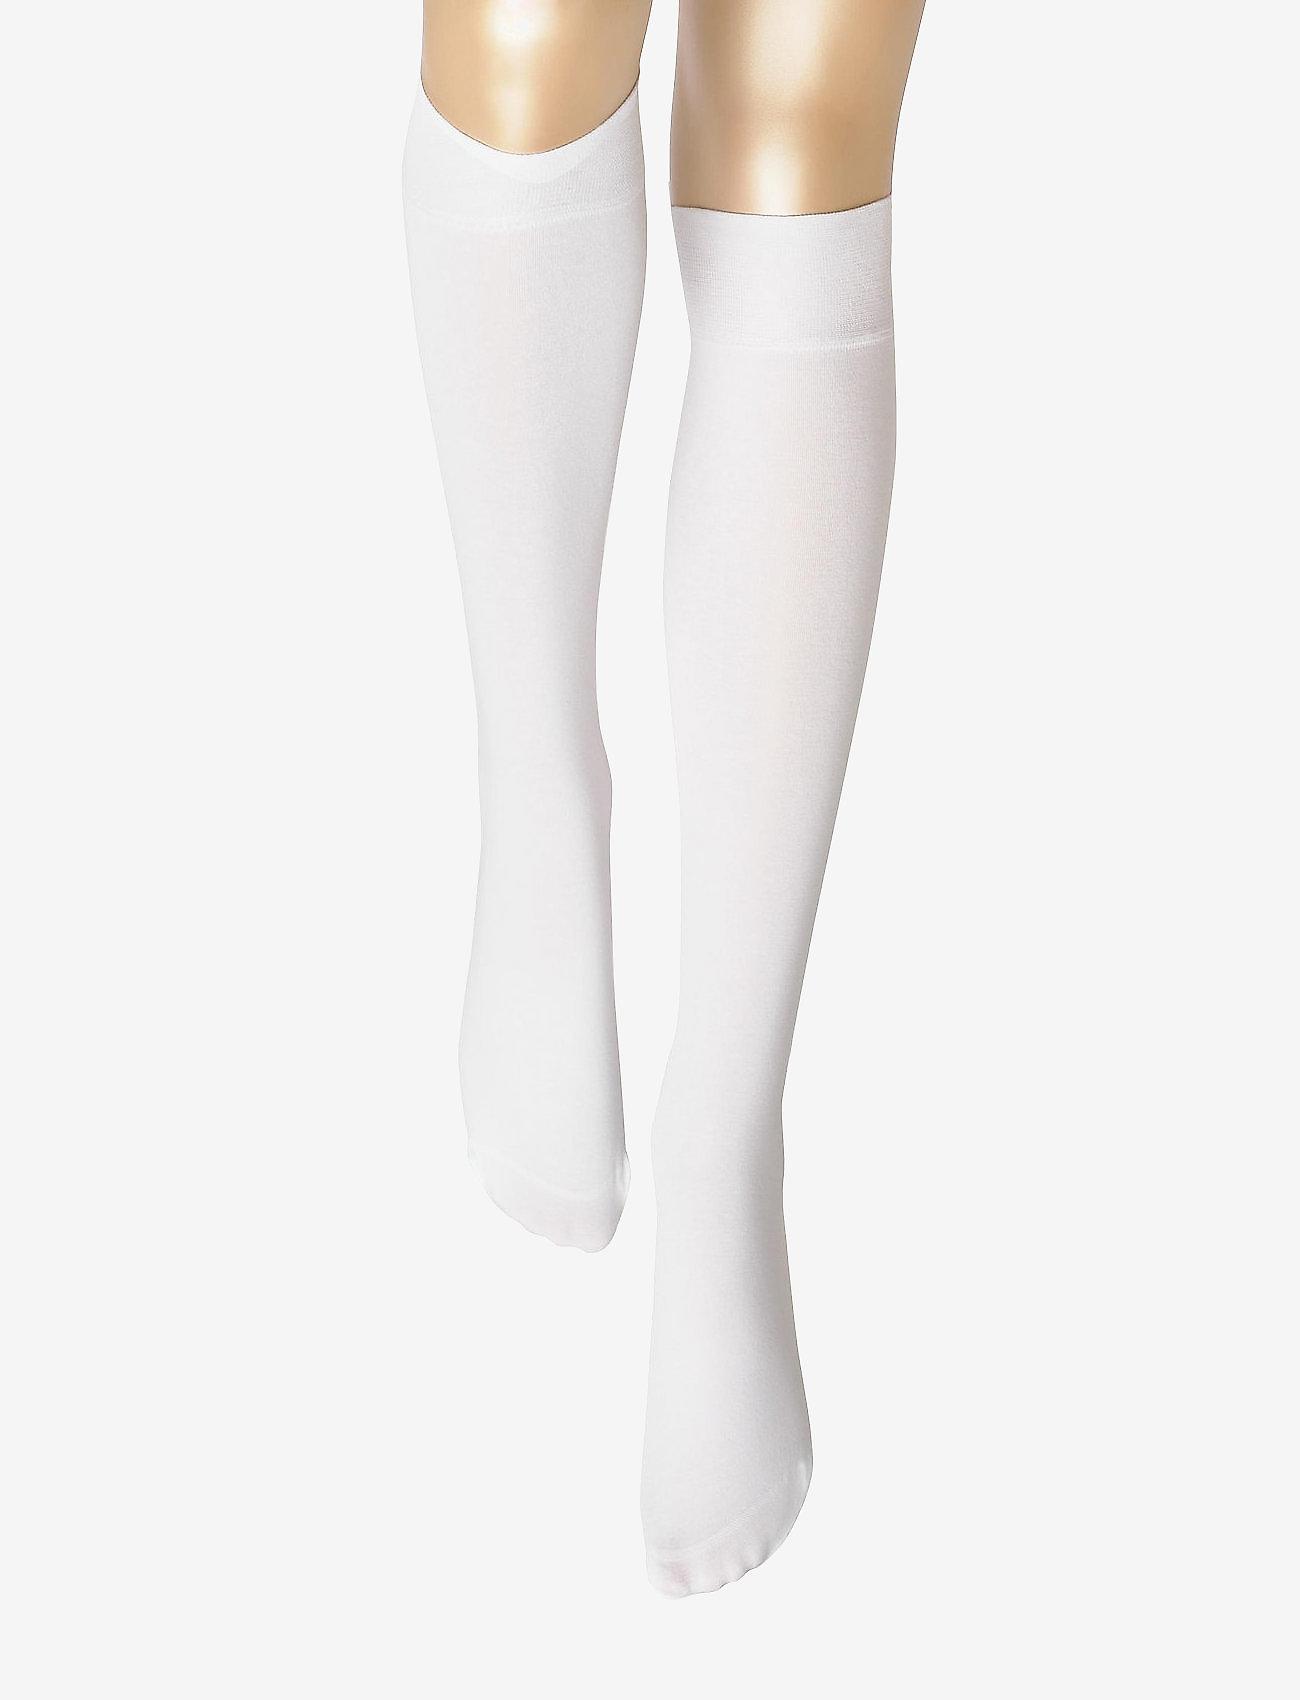 Vogue - Ladies knee high, Silky Cotton Knee - knee-highs - white - 1